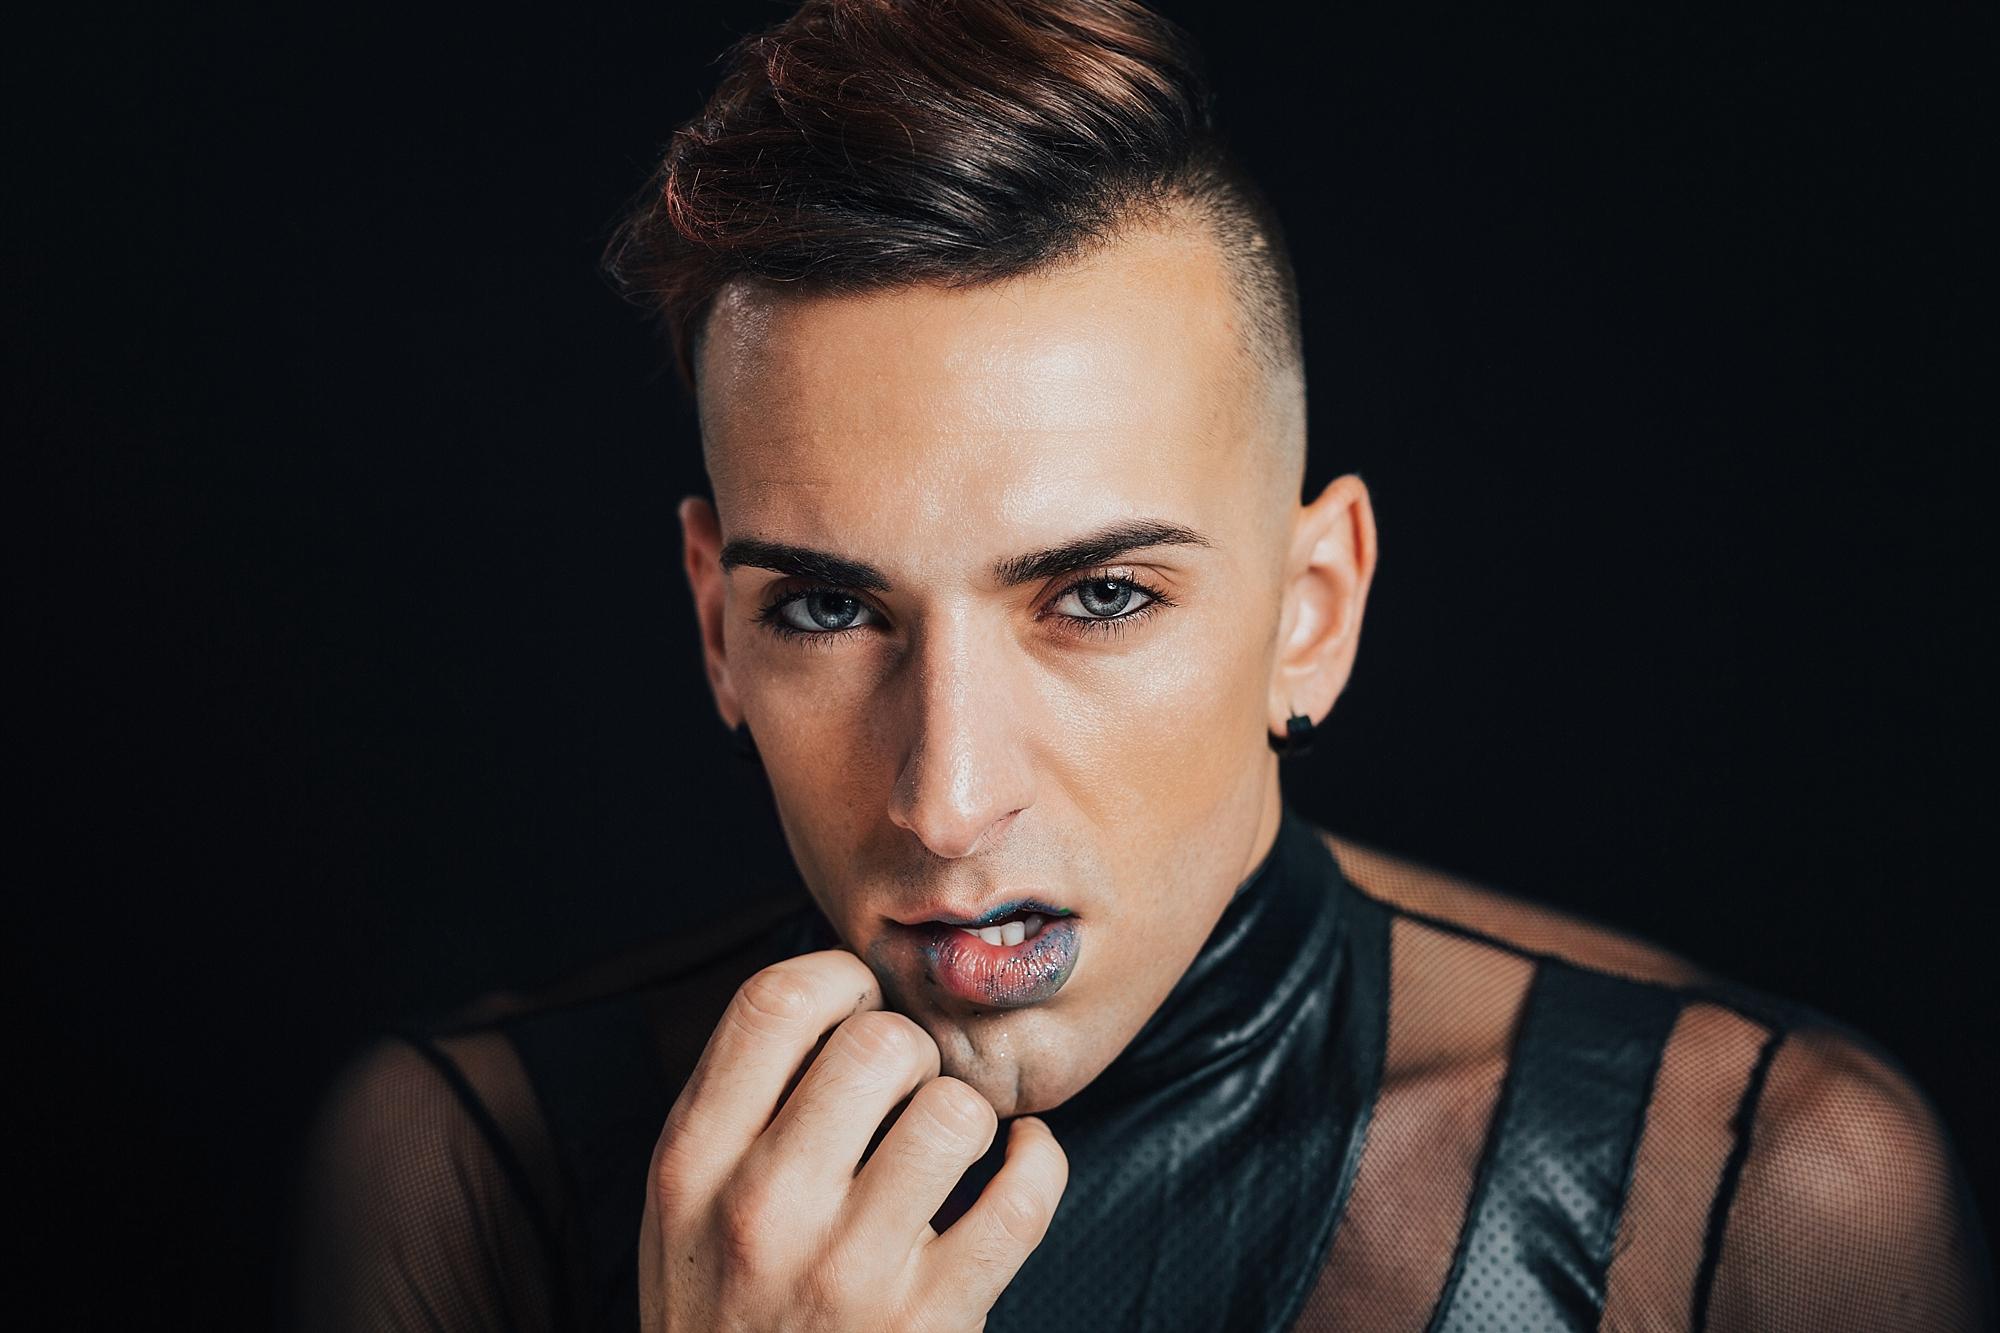 Joe_Mac_Creative_Joey_Arrigo_Philadelphia_Gay_Fashion_Photography__0017.jpg